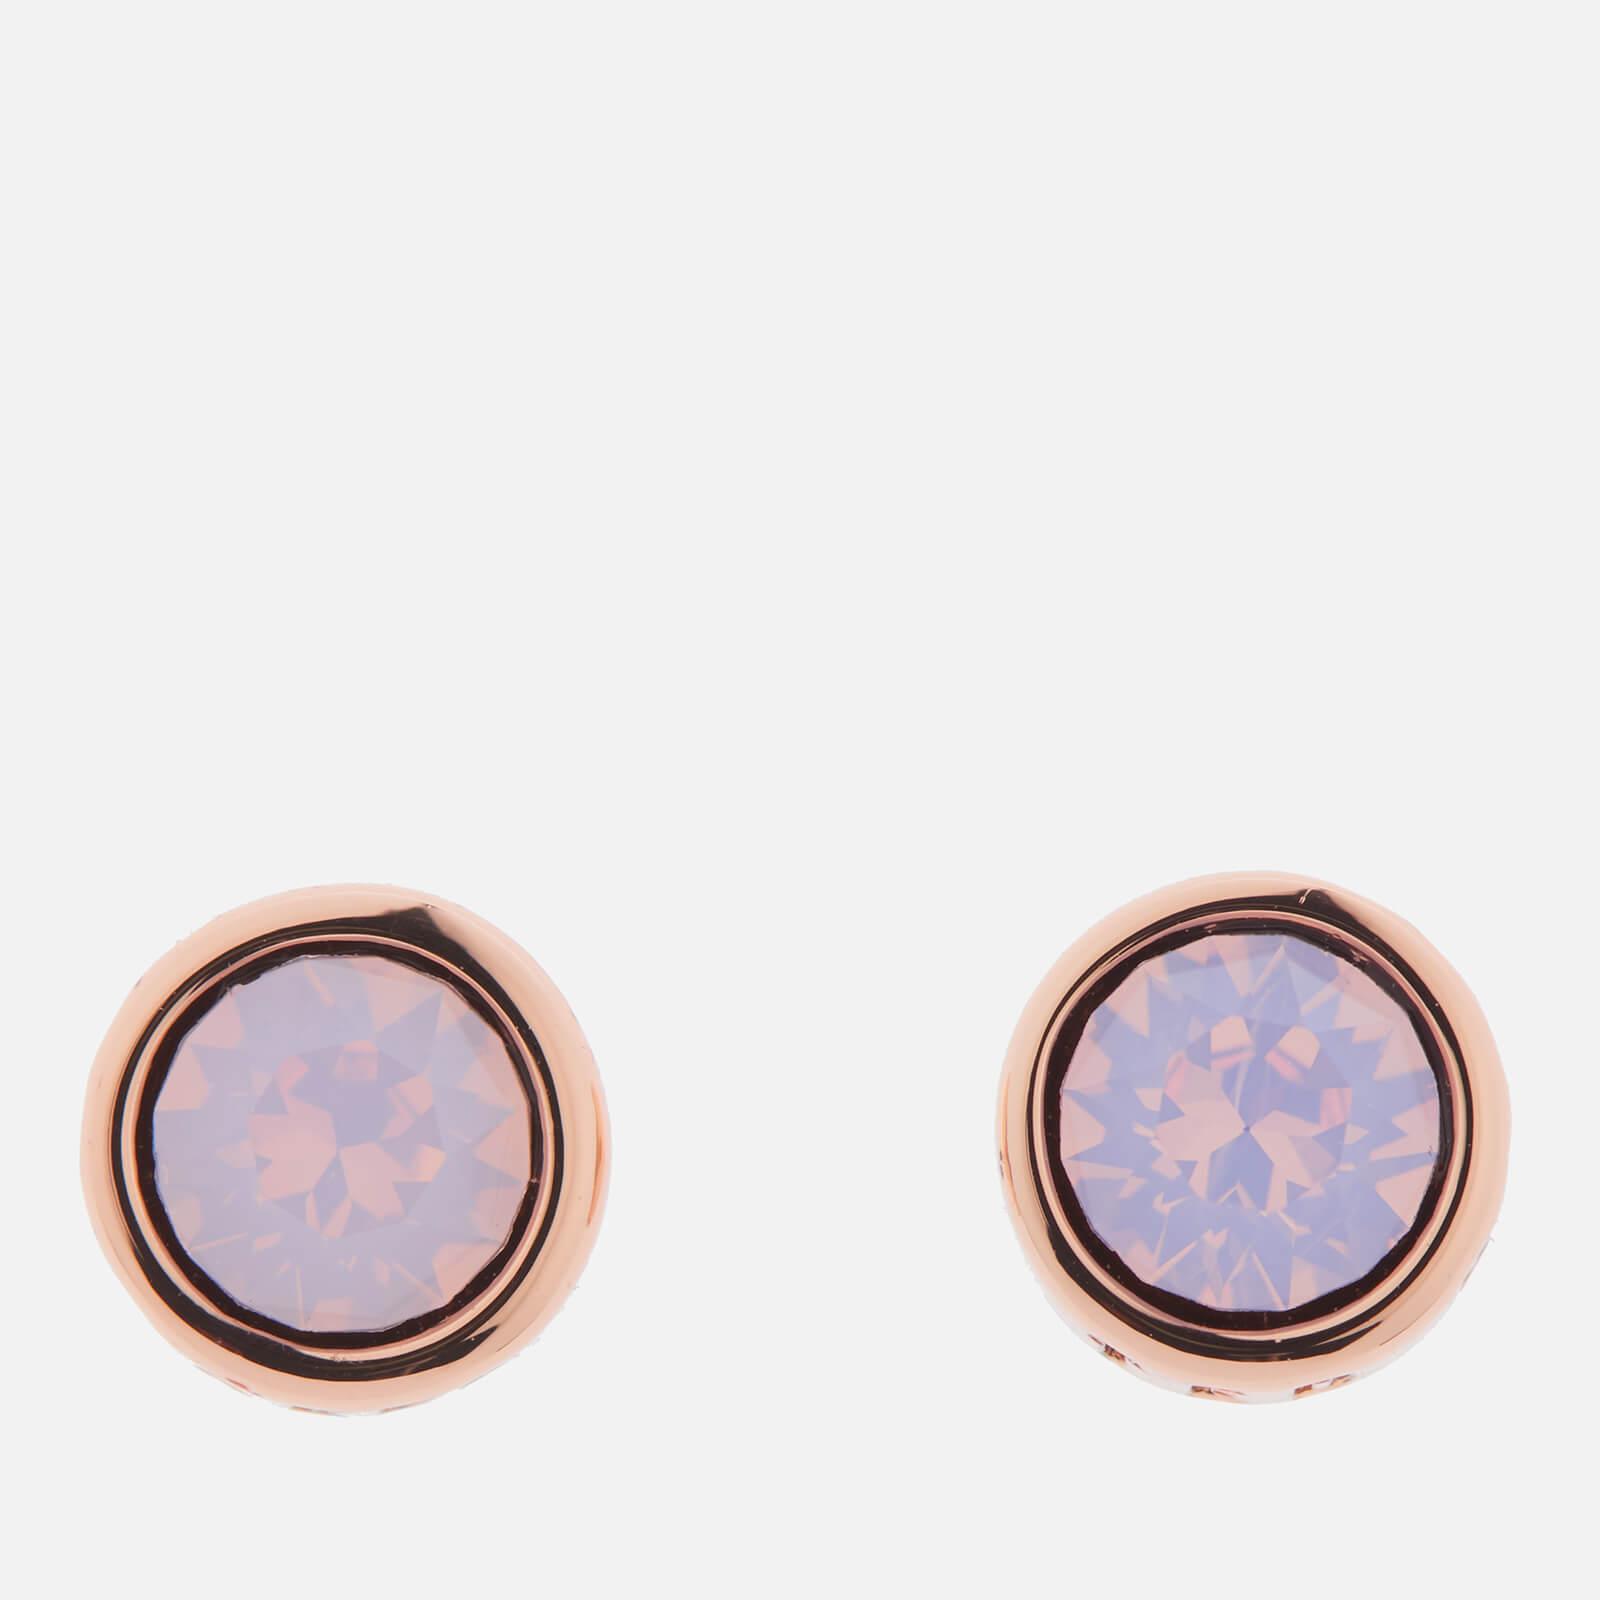 Ted Baker Women's Sinaa Swarovski Crystal Stud Earrings - Rose Gold/Rose Water Opal - Rose Gold